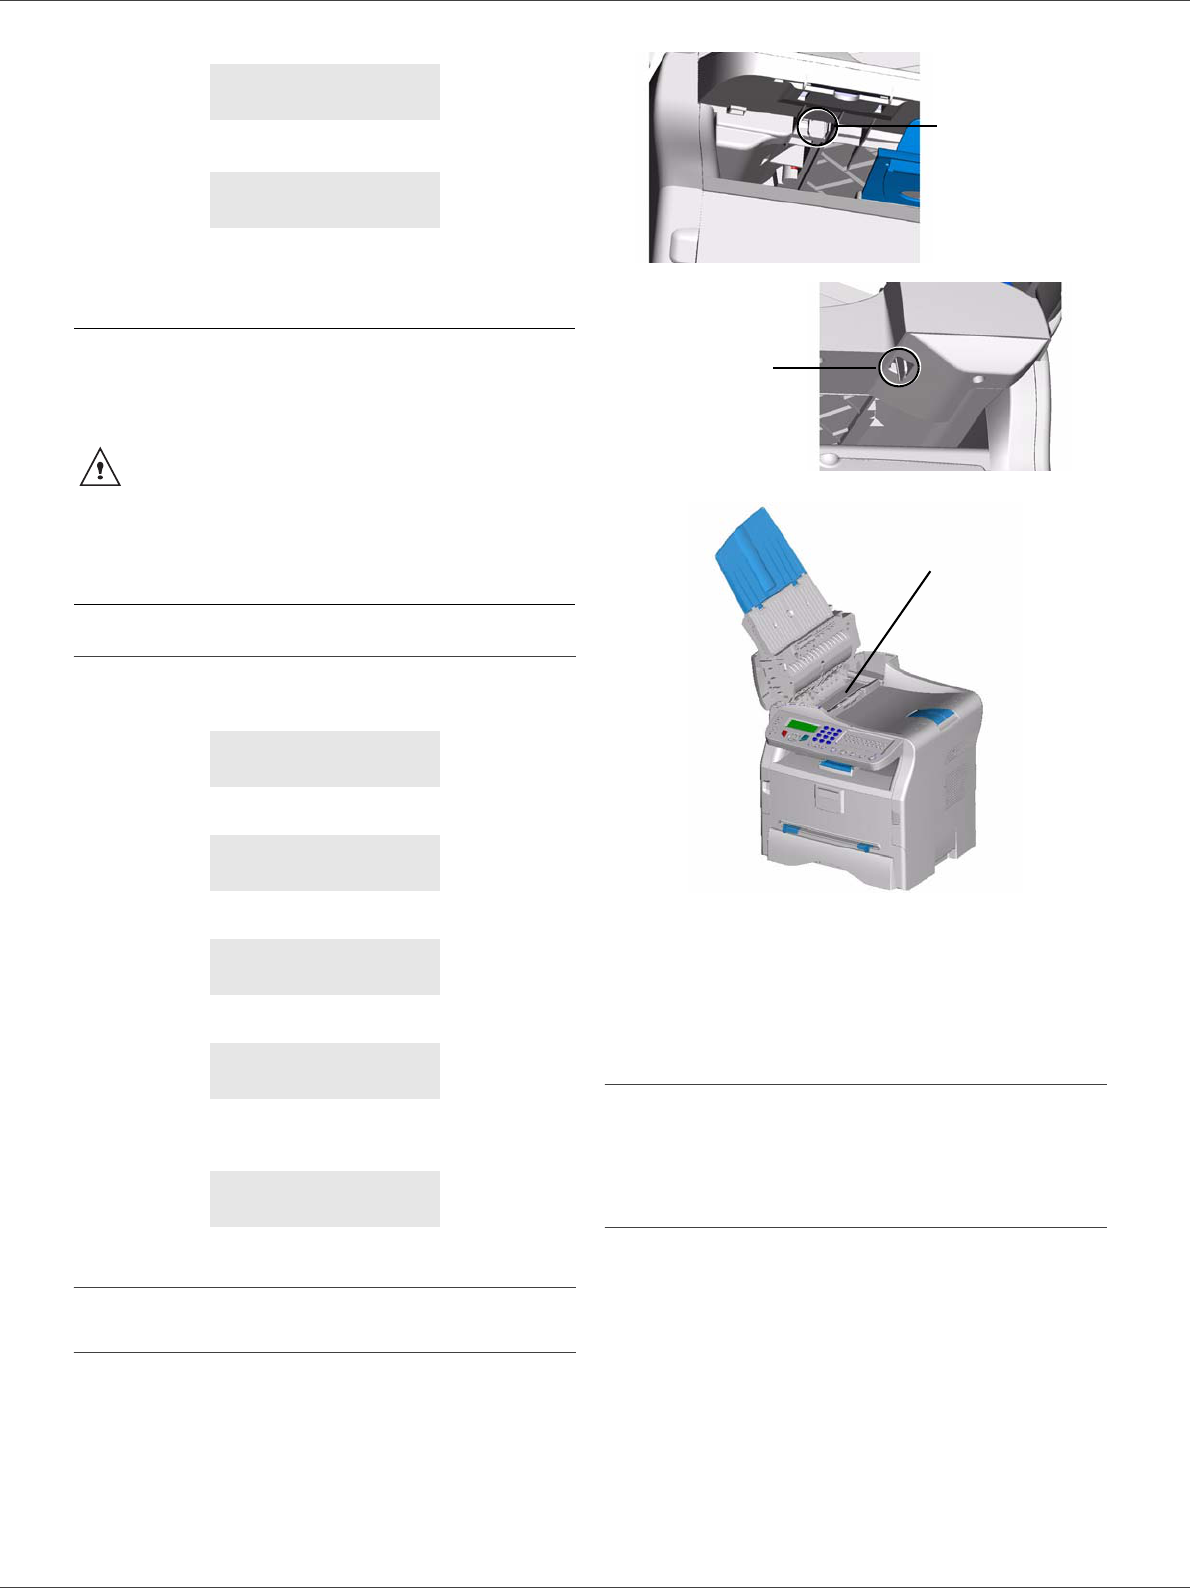 Handleiding Ricoh fax 1140l (pagina 54 van 59) (English)